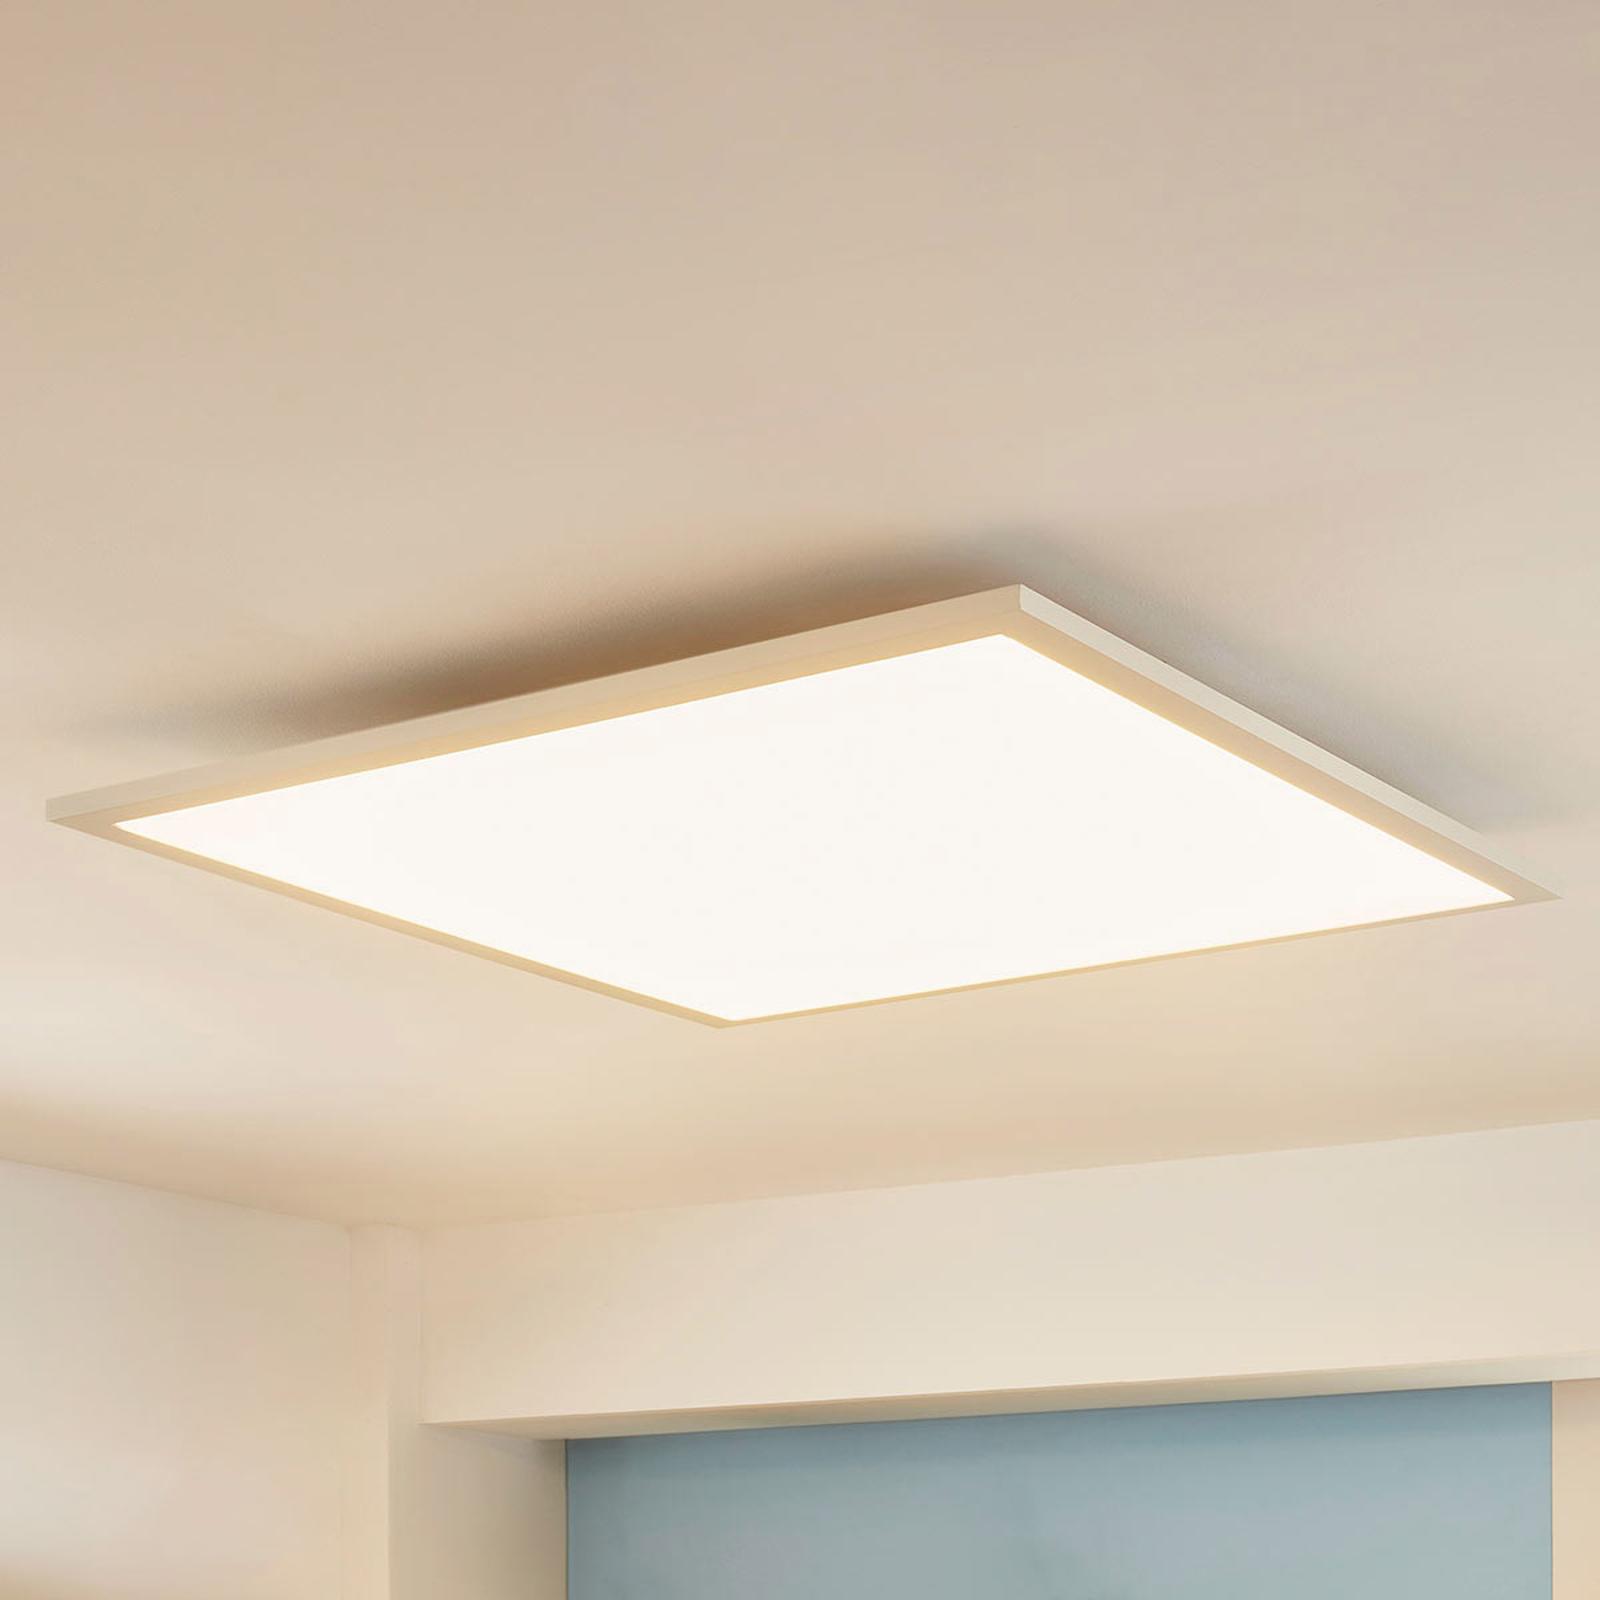 Kwadratowy panel LED Enja 62 x 62 cm